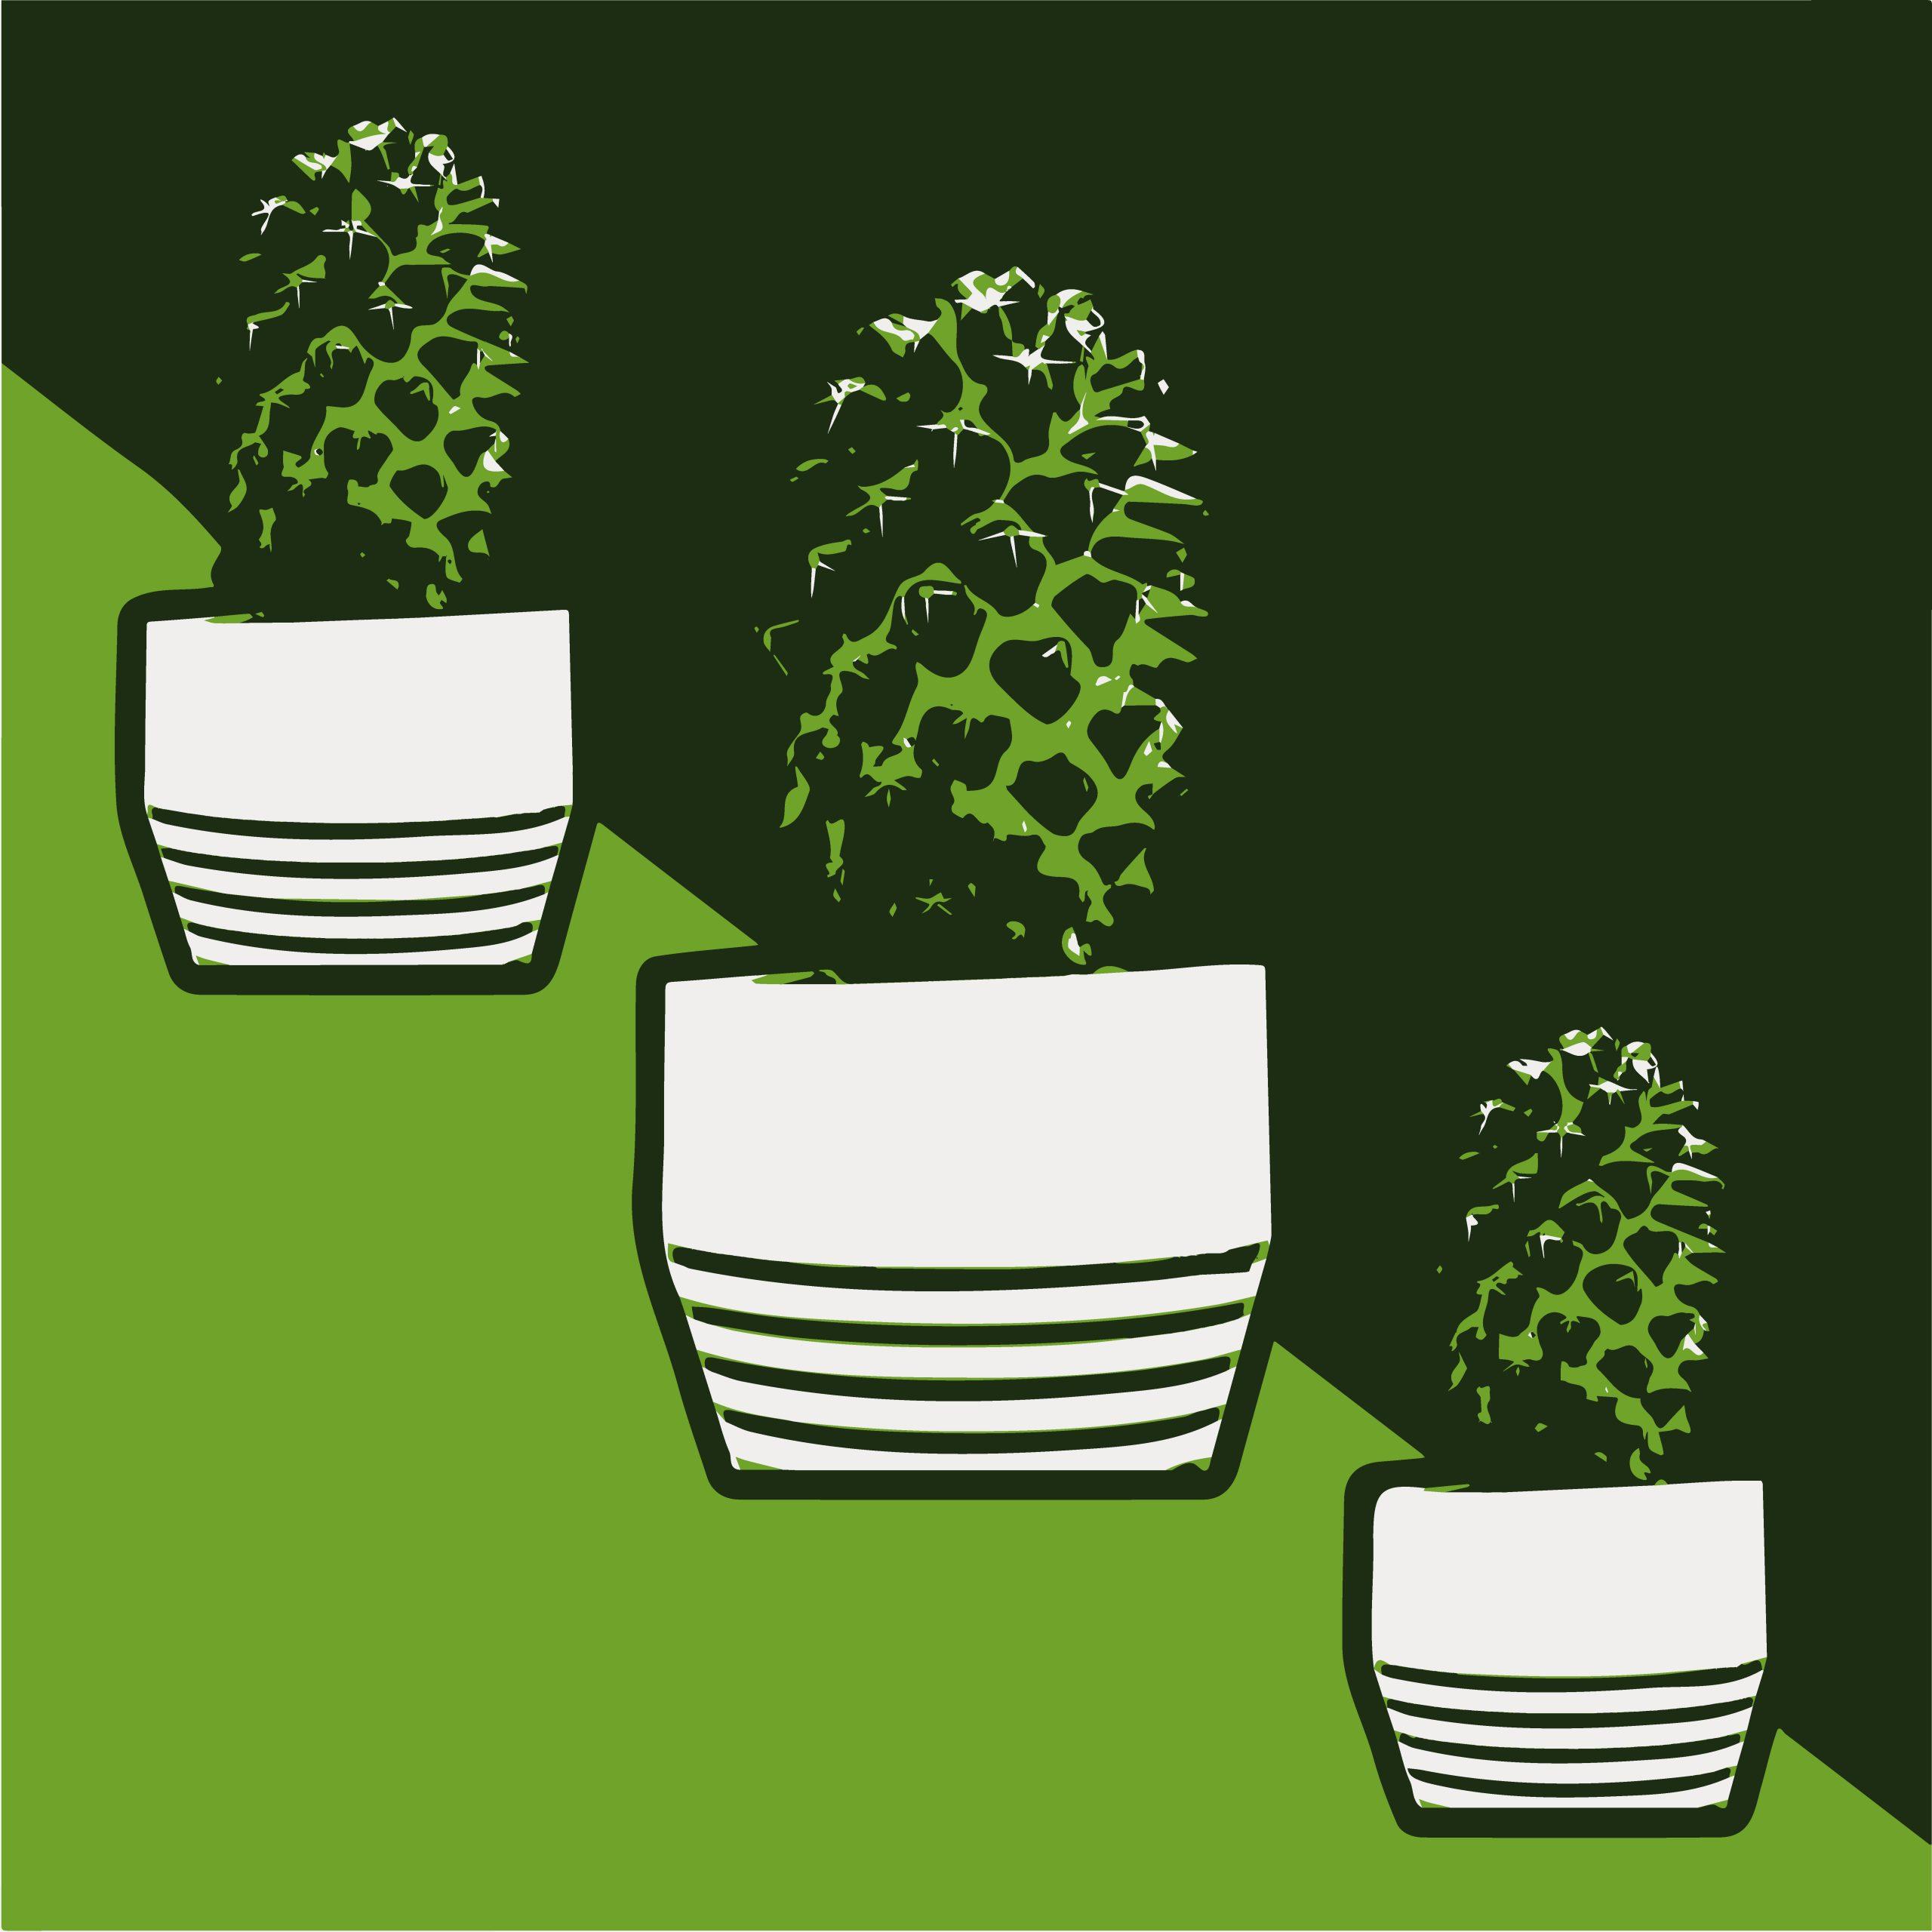 Cactus houseplants illustration